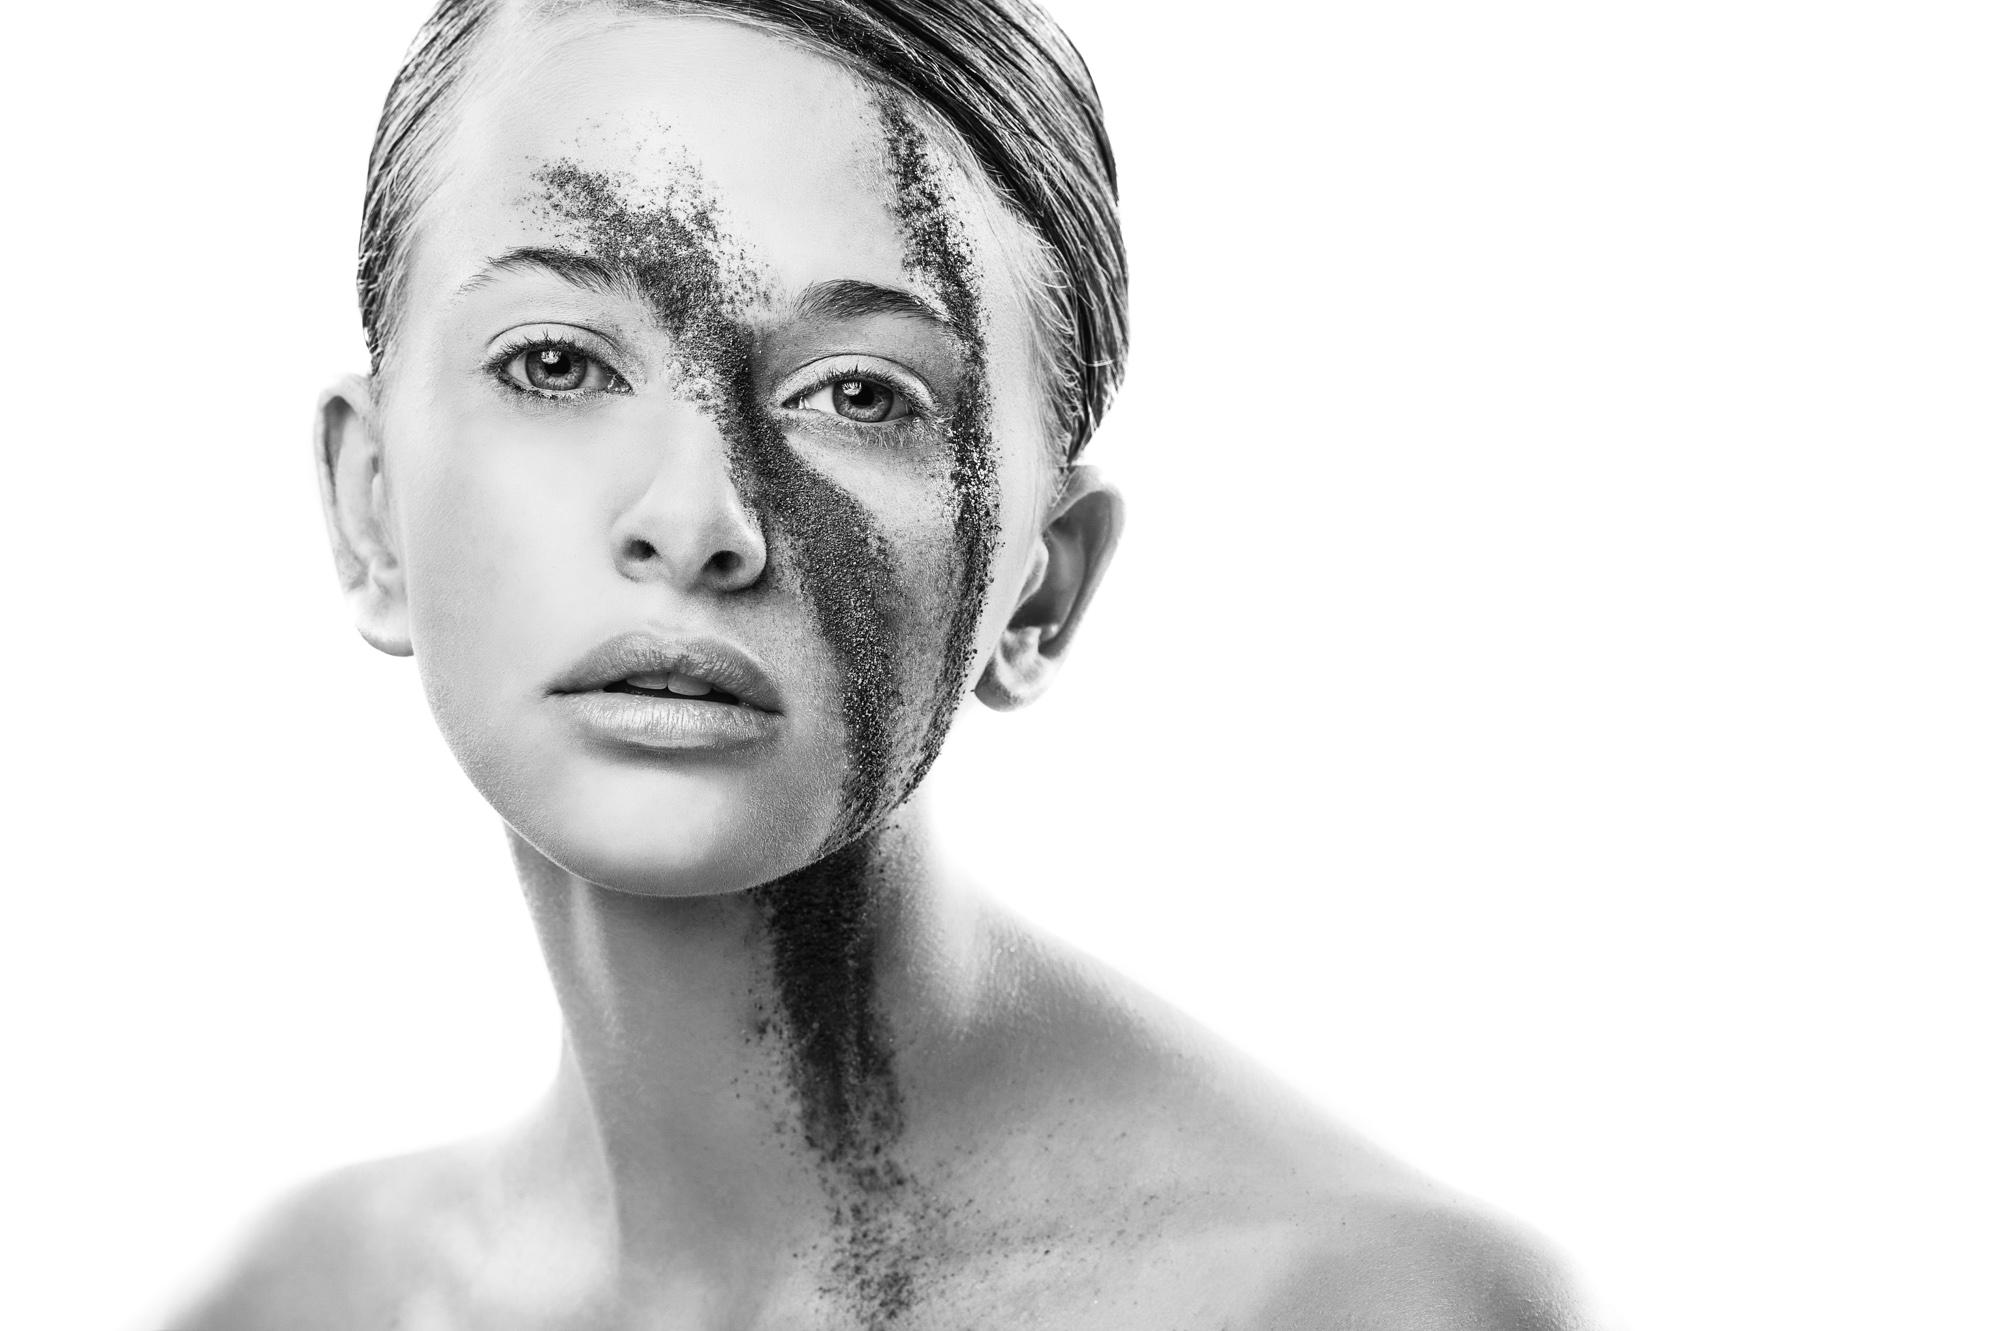 makeup-creative-8-edit.jpg